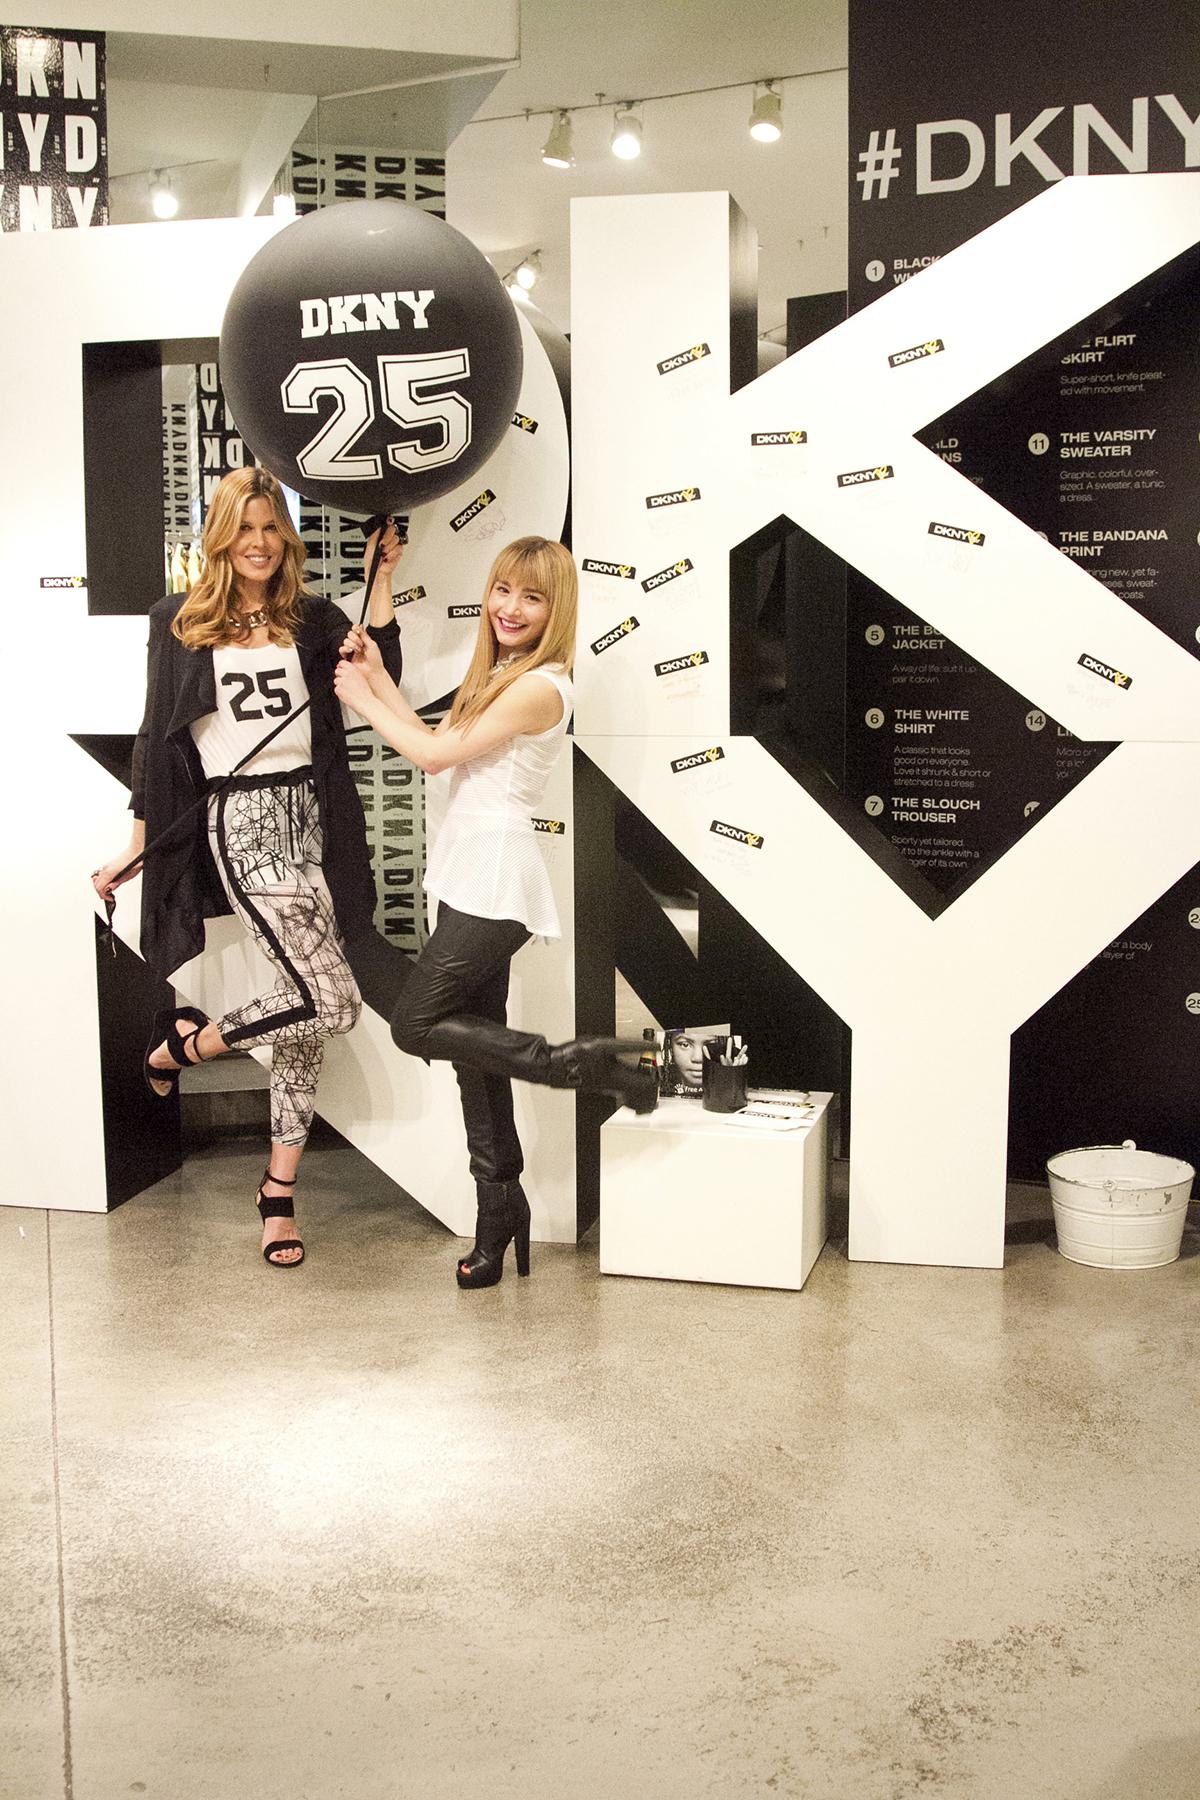 Having fun celebrating DKNY's 25th Birthday with Fashion/Beauty Expert Mary Alice Stephenson.